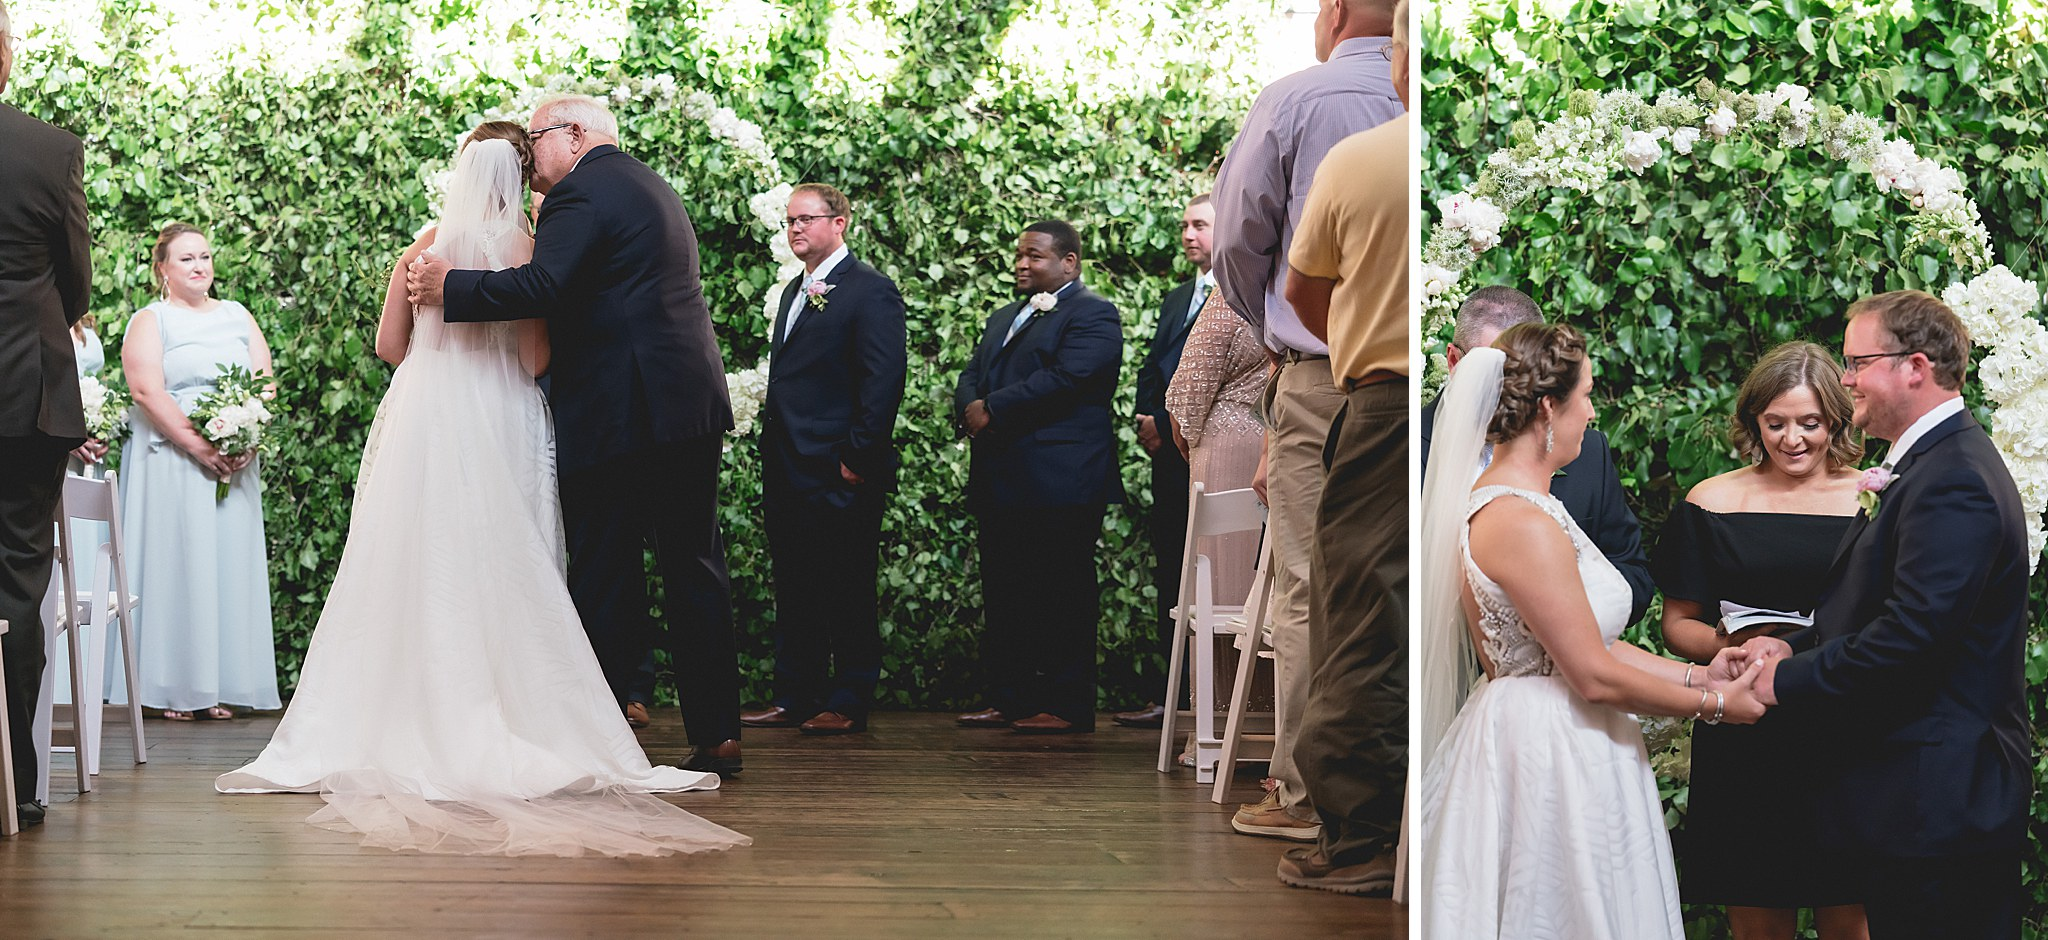 Washington-NC-Wedding-Photographer 0076.jpg